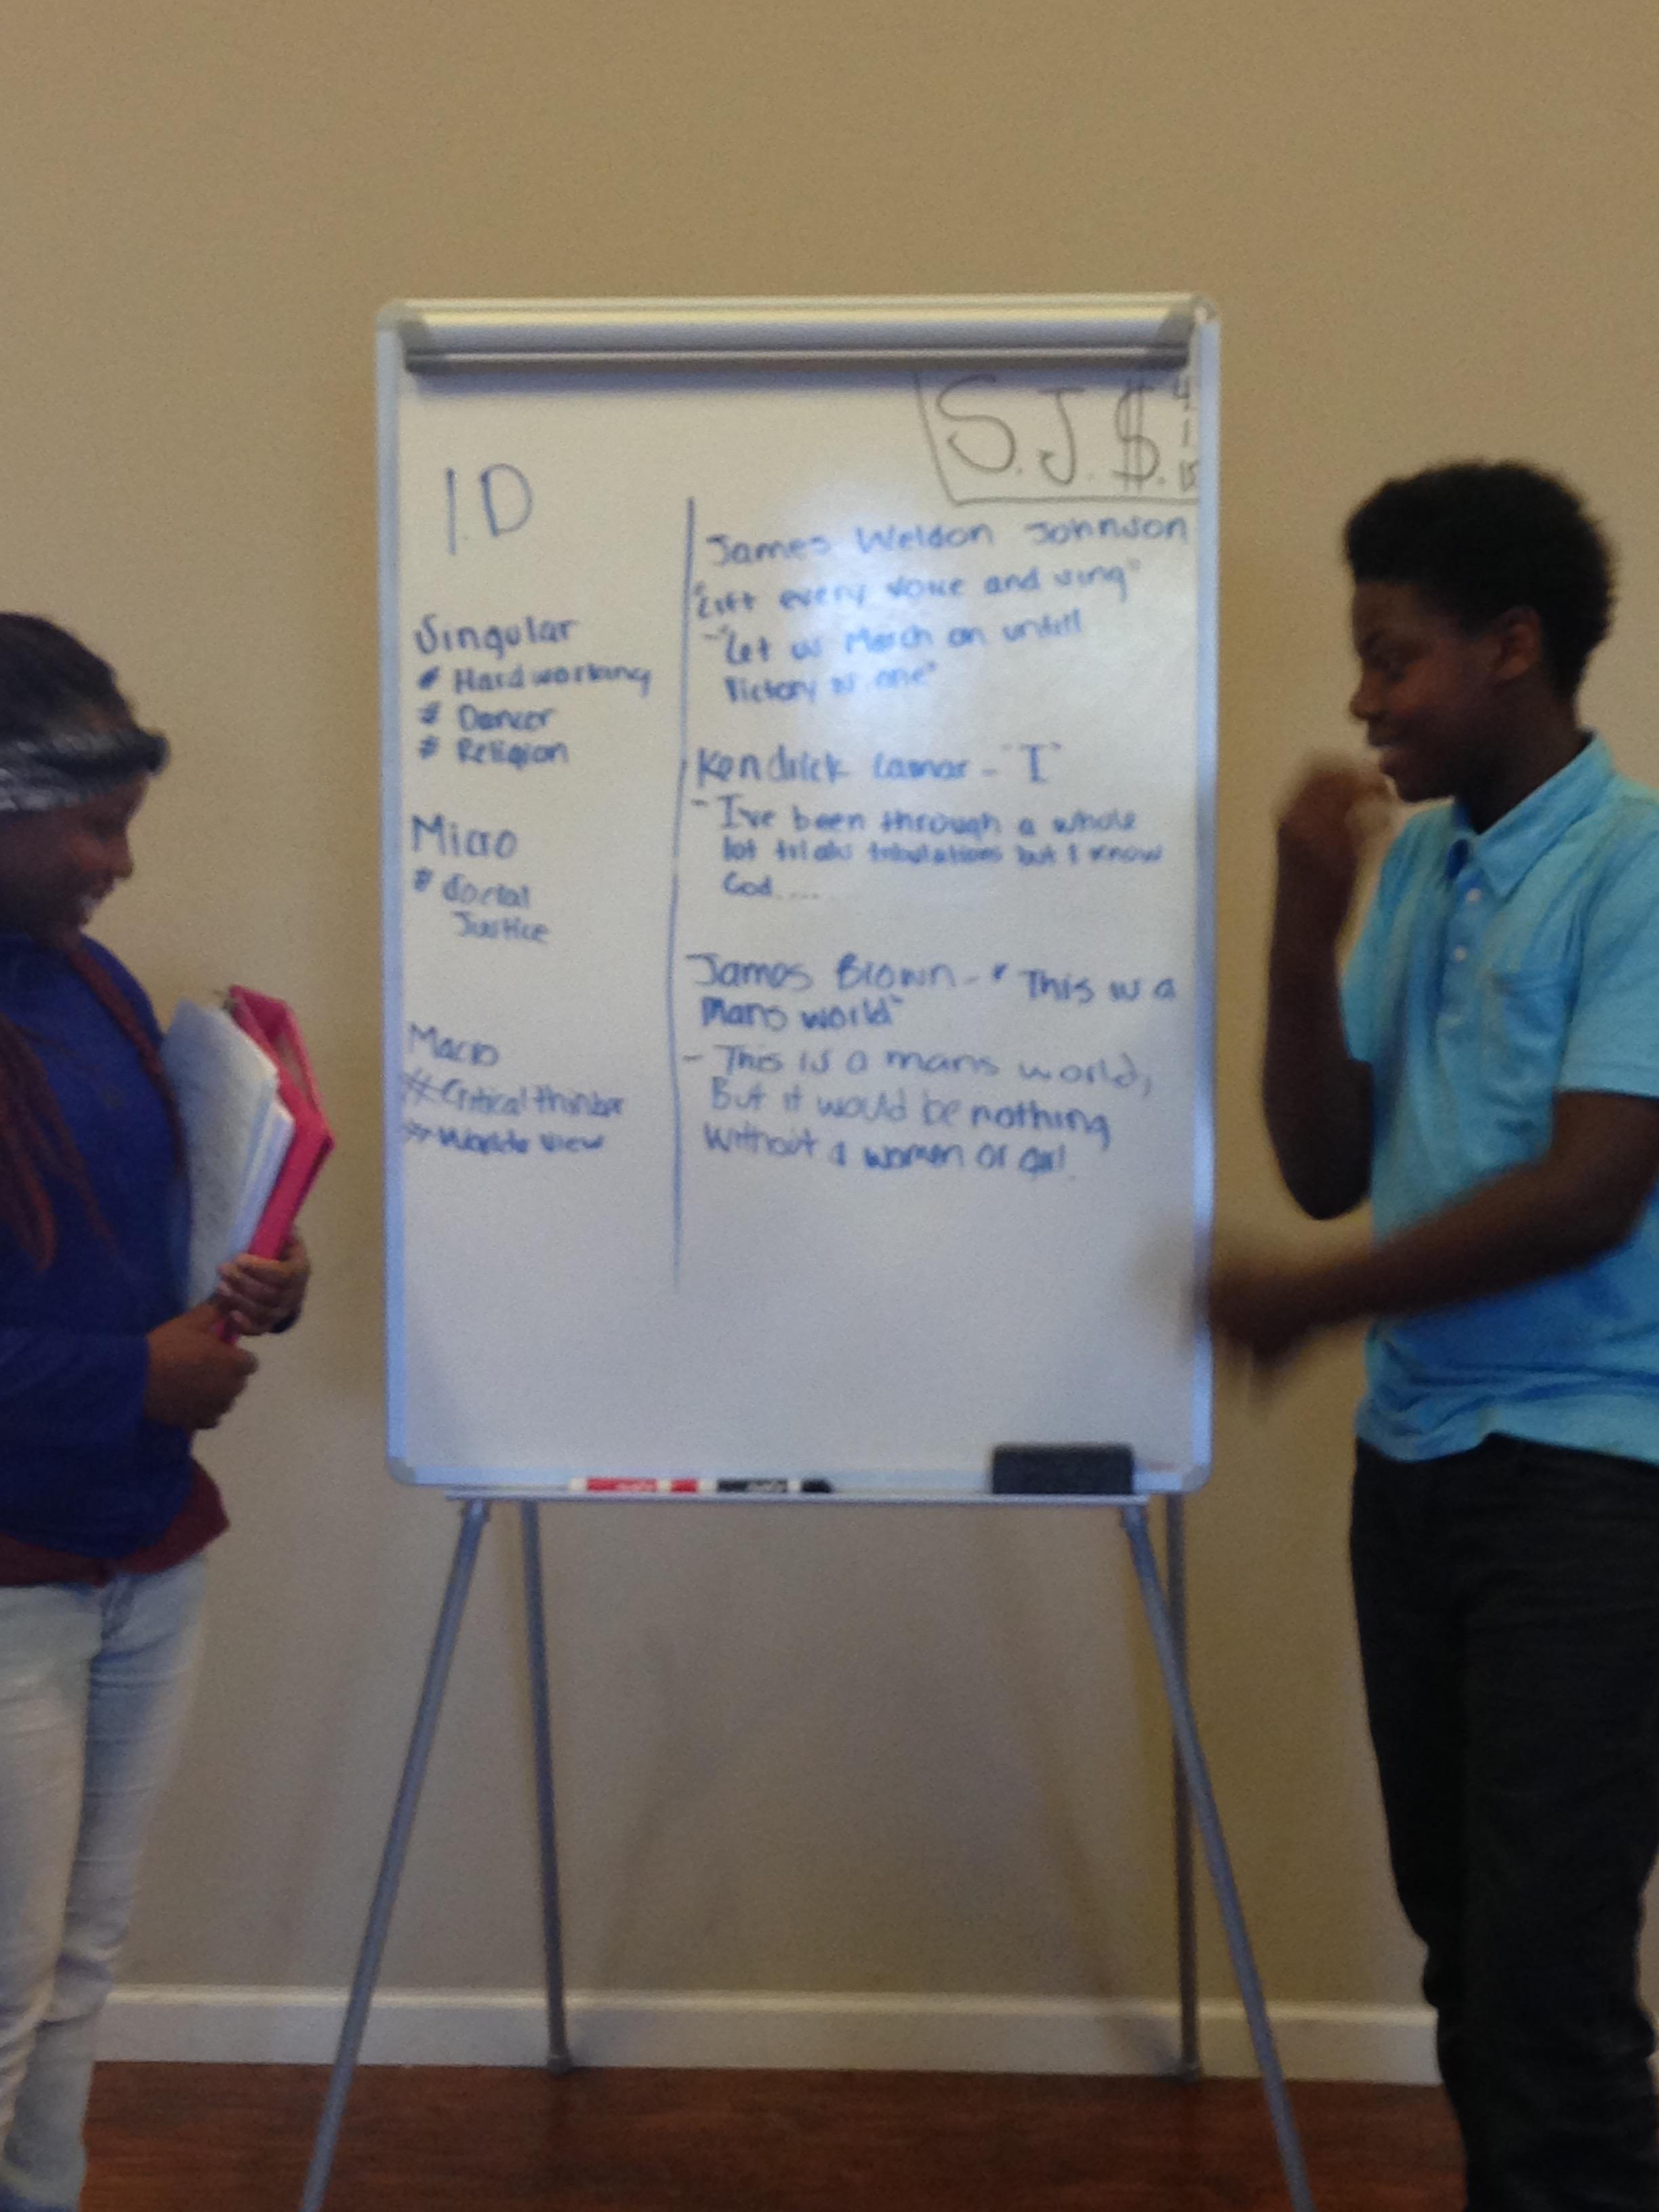 Presentations in the Social Justice Seminar Class